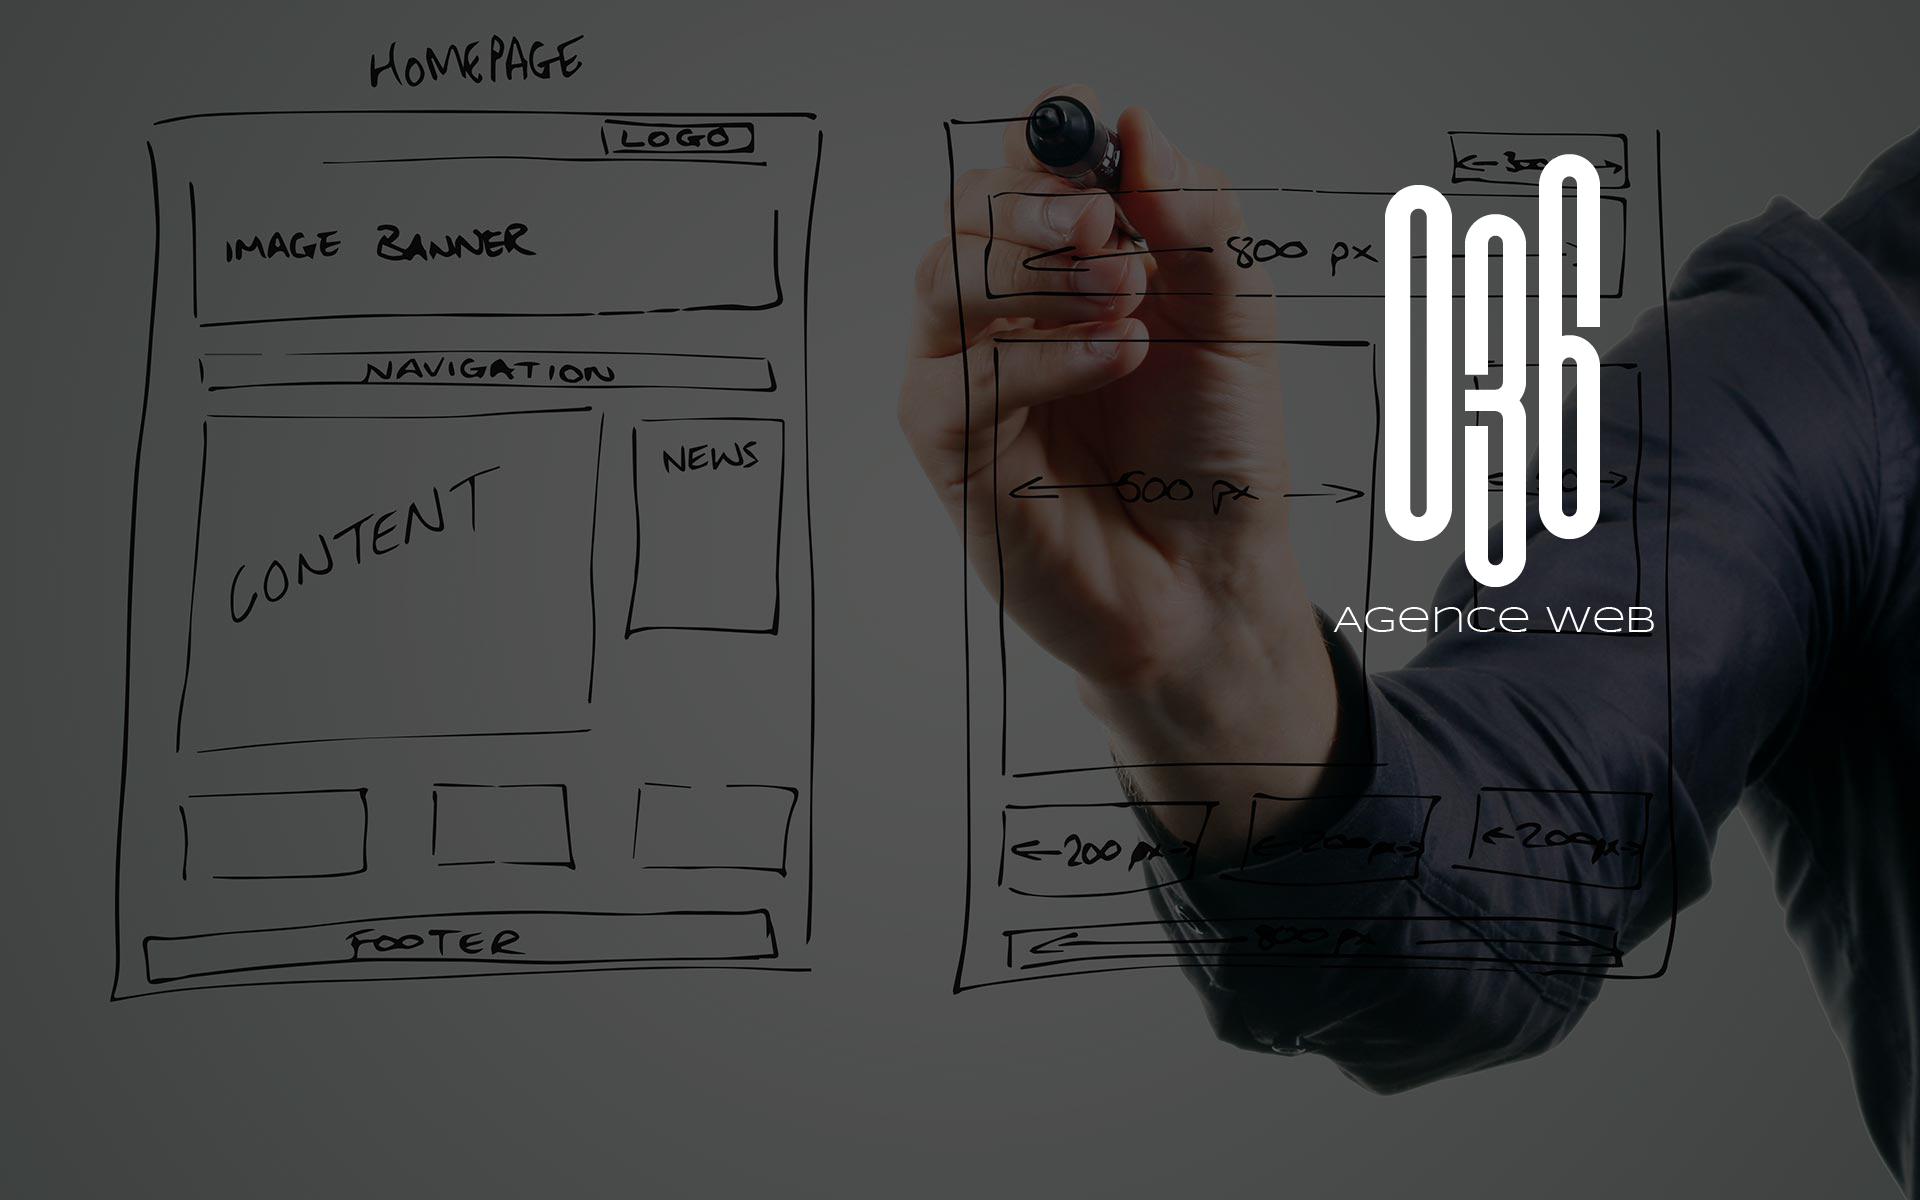 O36 AGENCE WEB